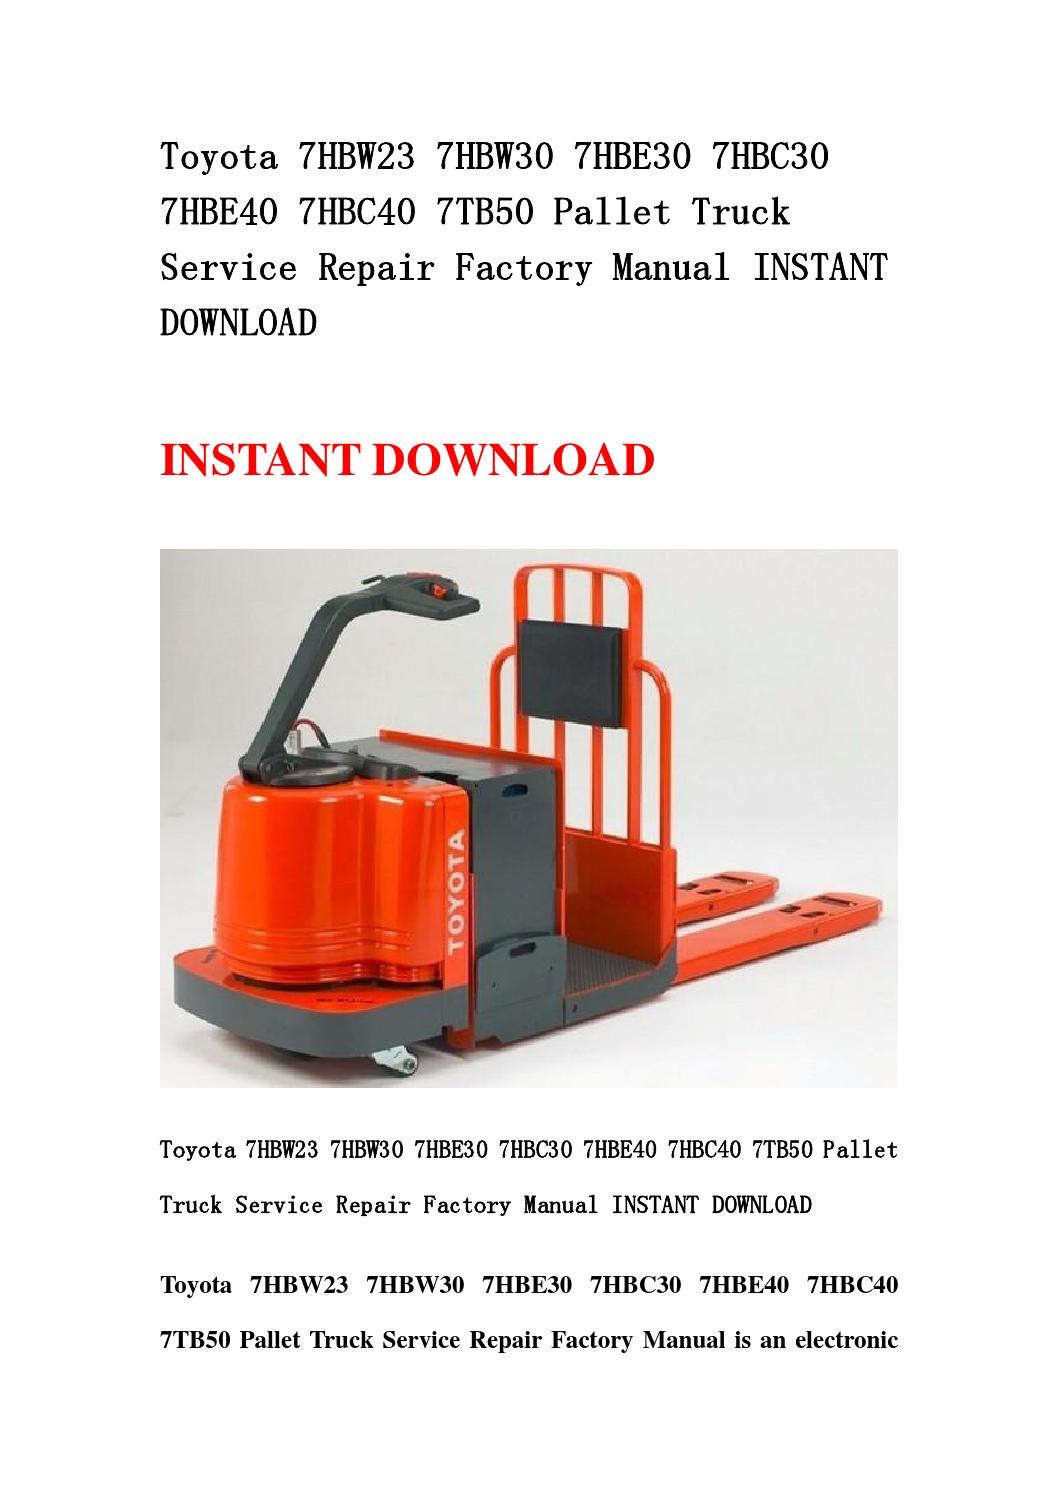 toyota hbw service manual